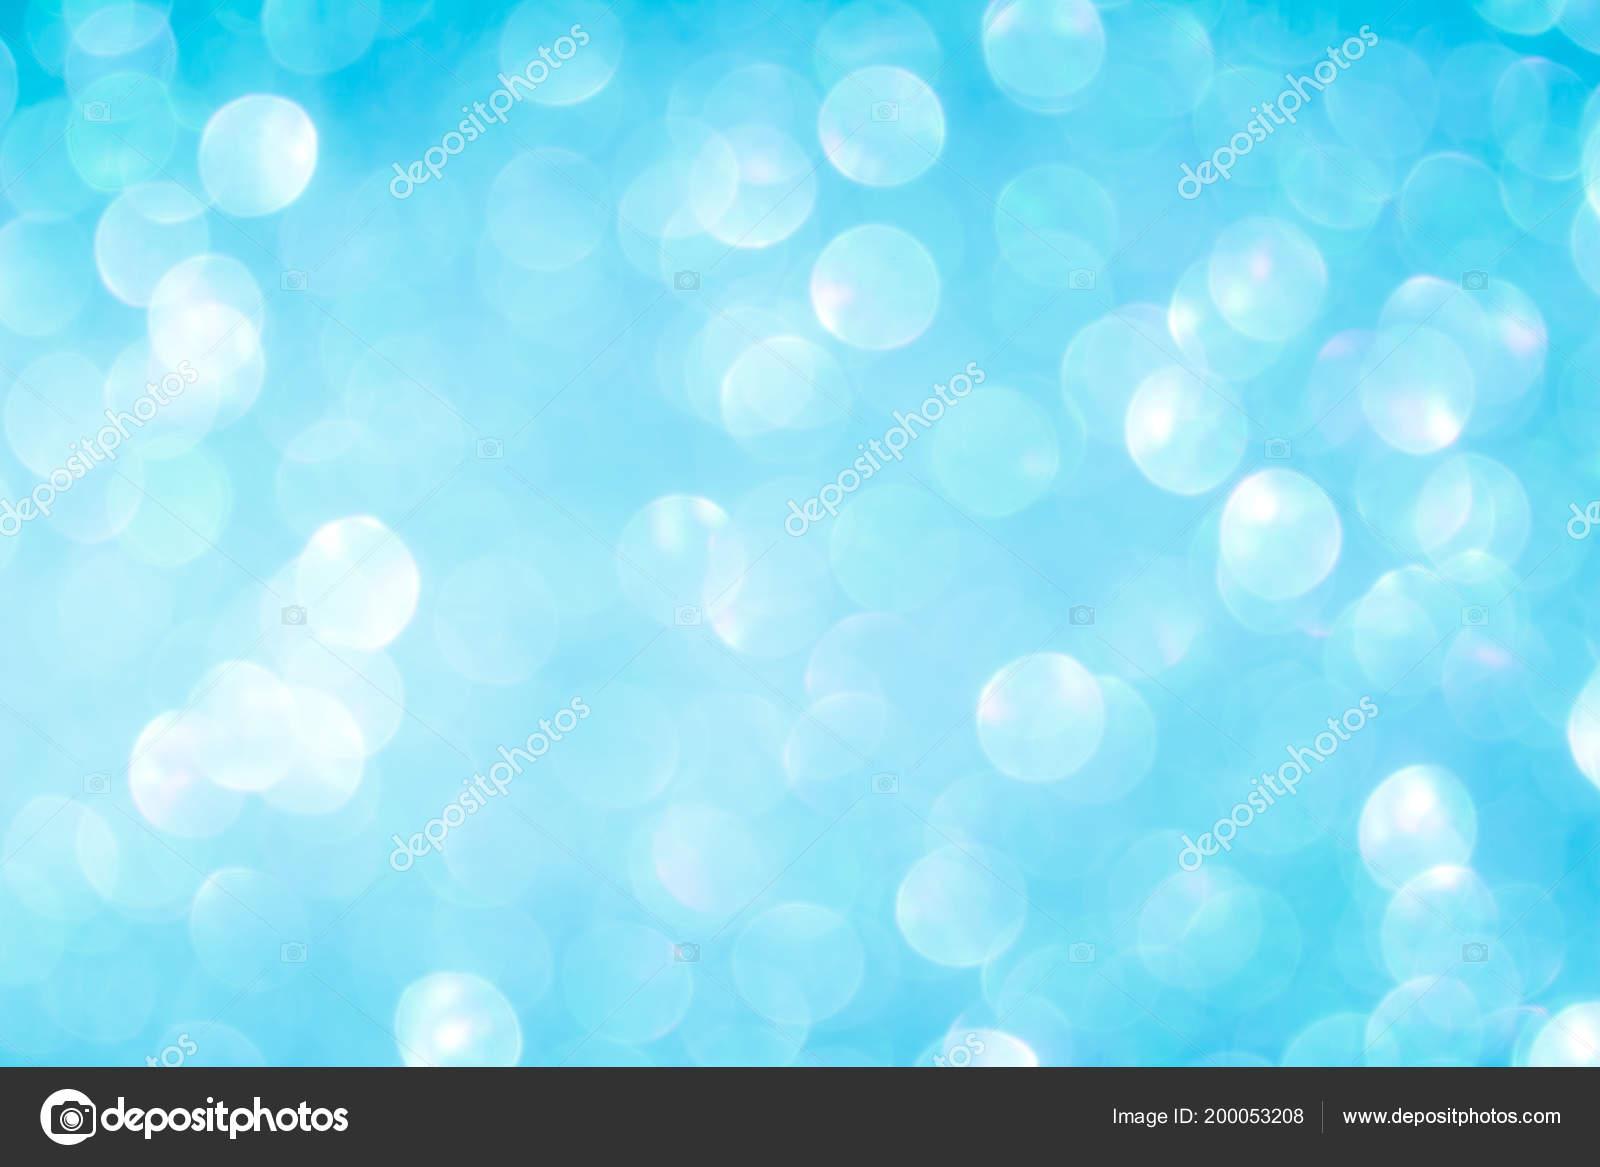 Blaue Weihnachtsbeleuchtung.Blaue Abstrakte Hintergrundunschärfe Weihnachtsbeleuchtung